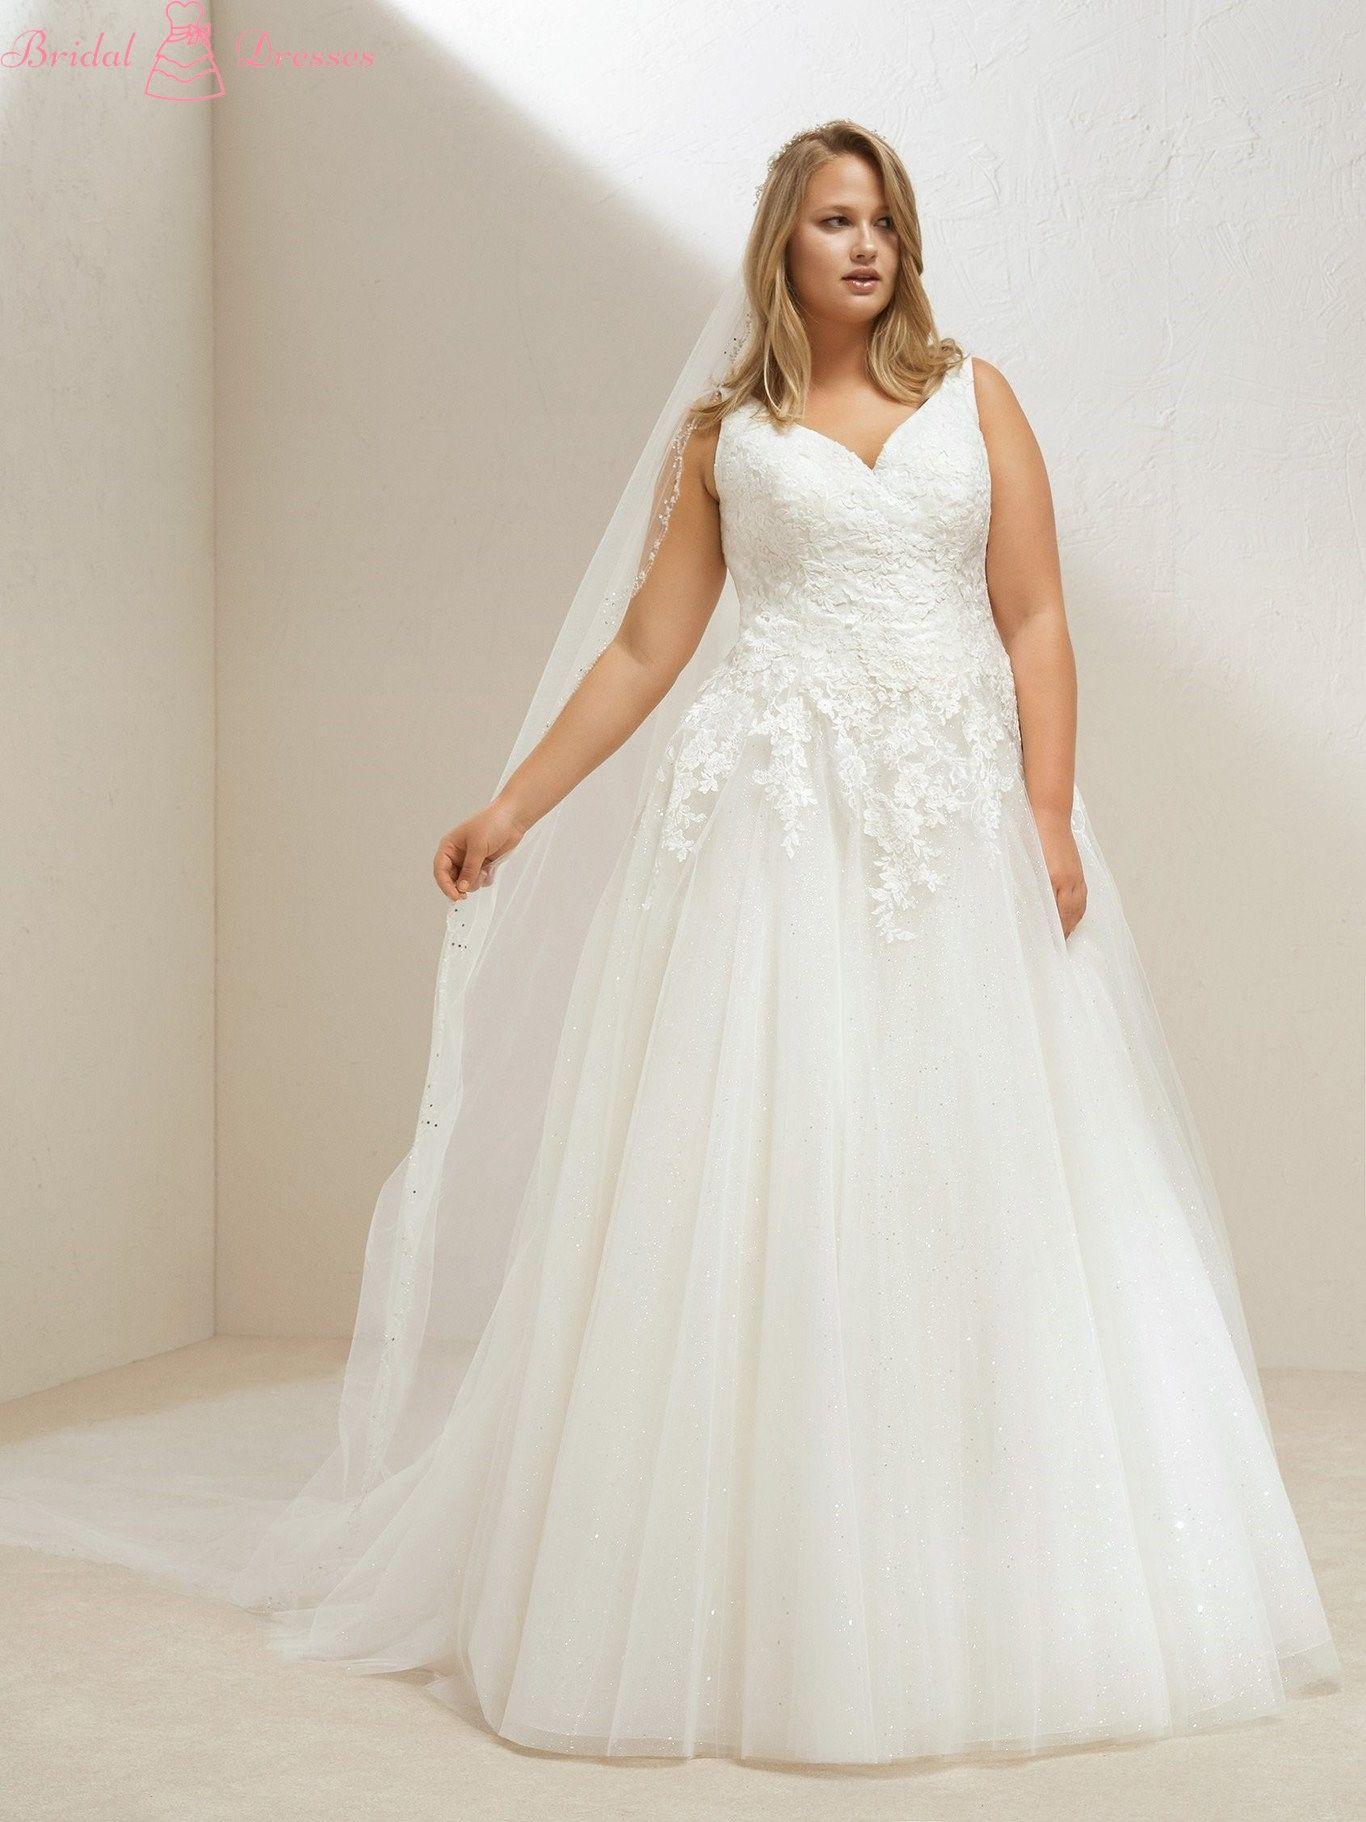 18 Brand Plus Size Wedding Dress   Bridal Dresses   Bridal dresses ...